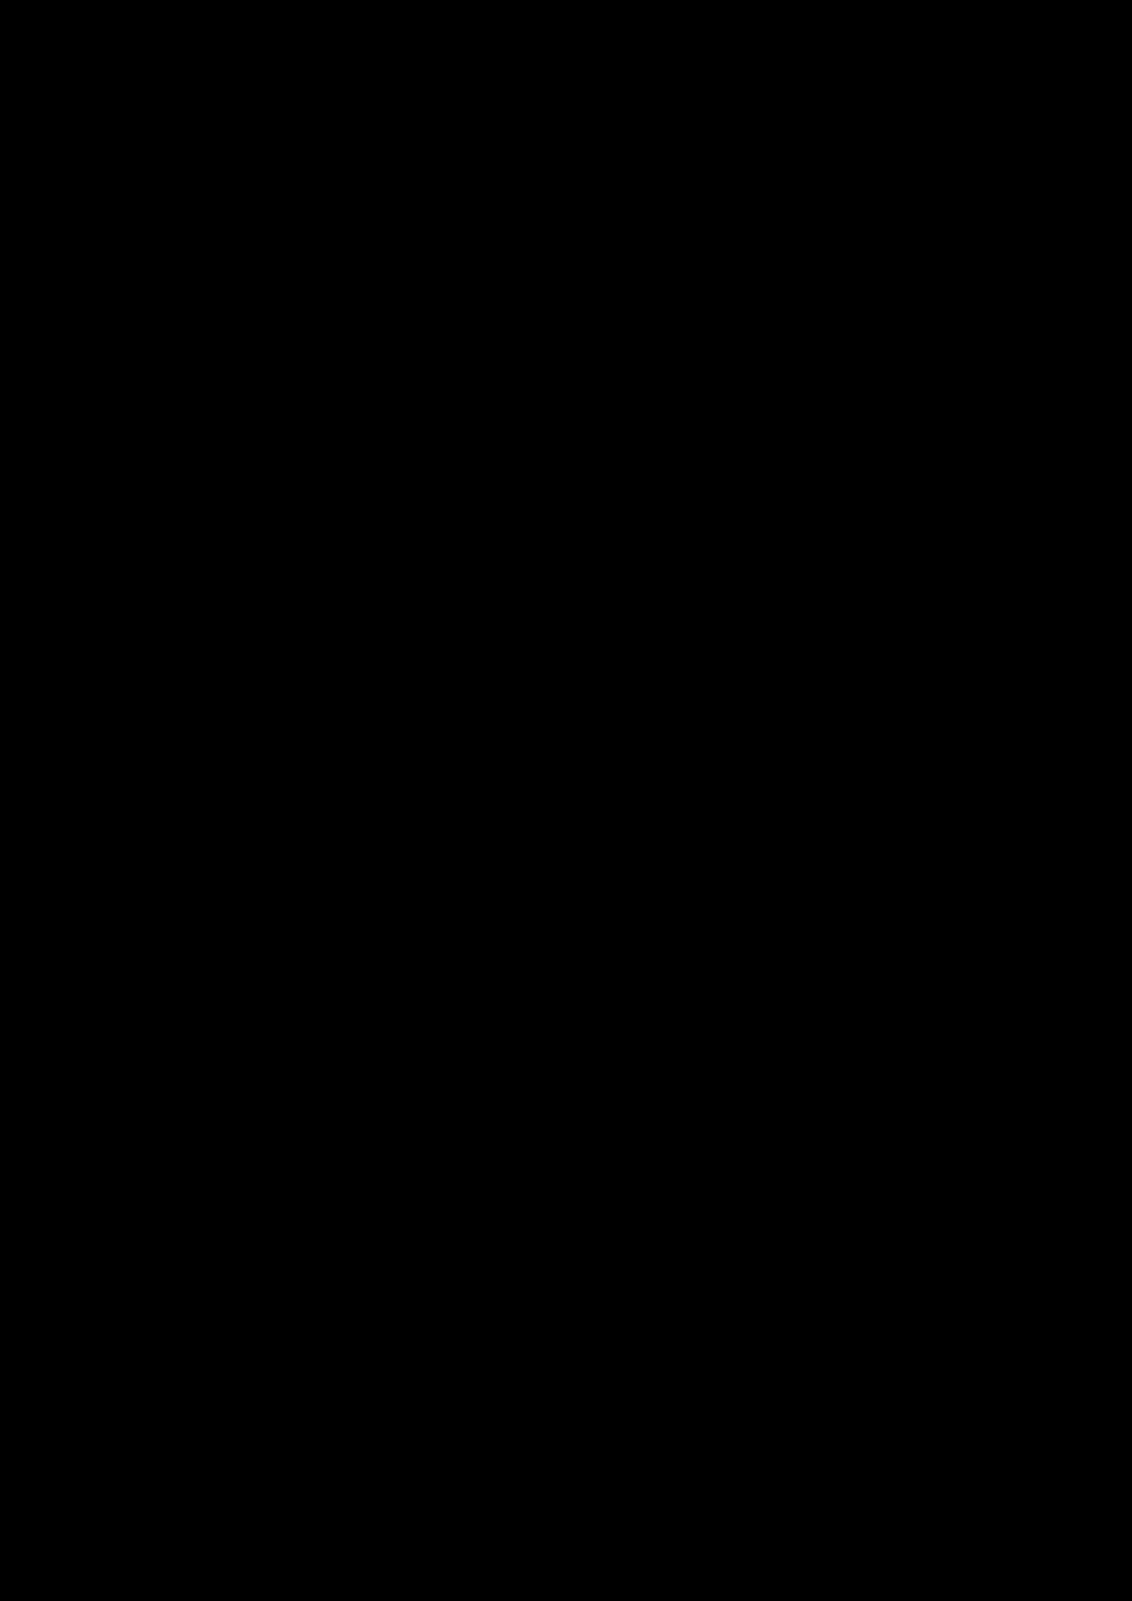 Belyiy sokol slide, Image 24